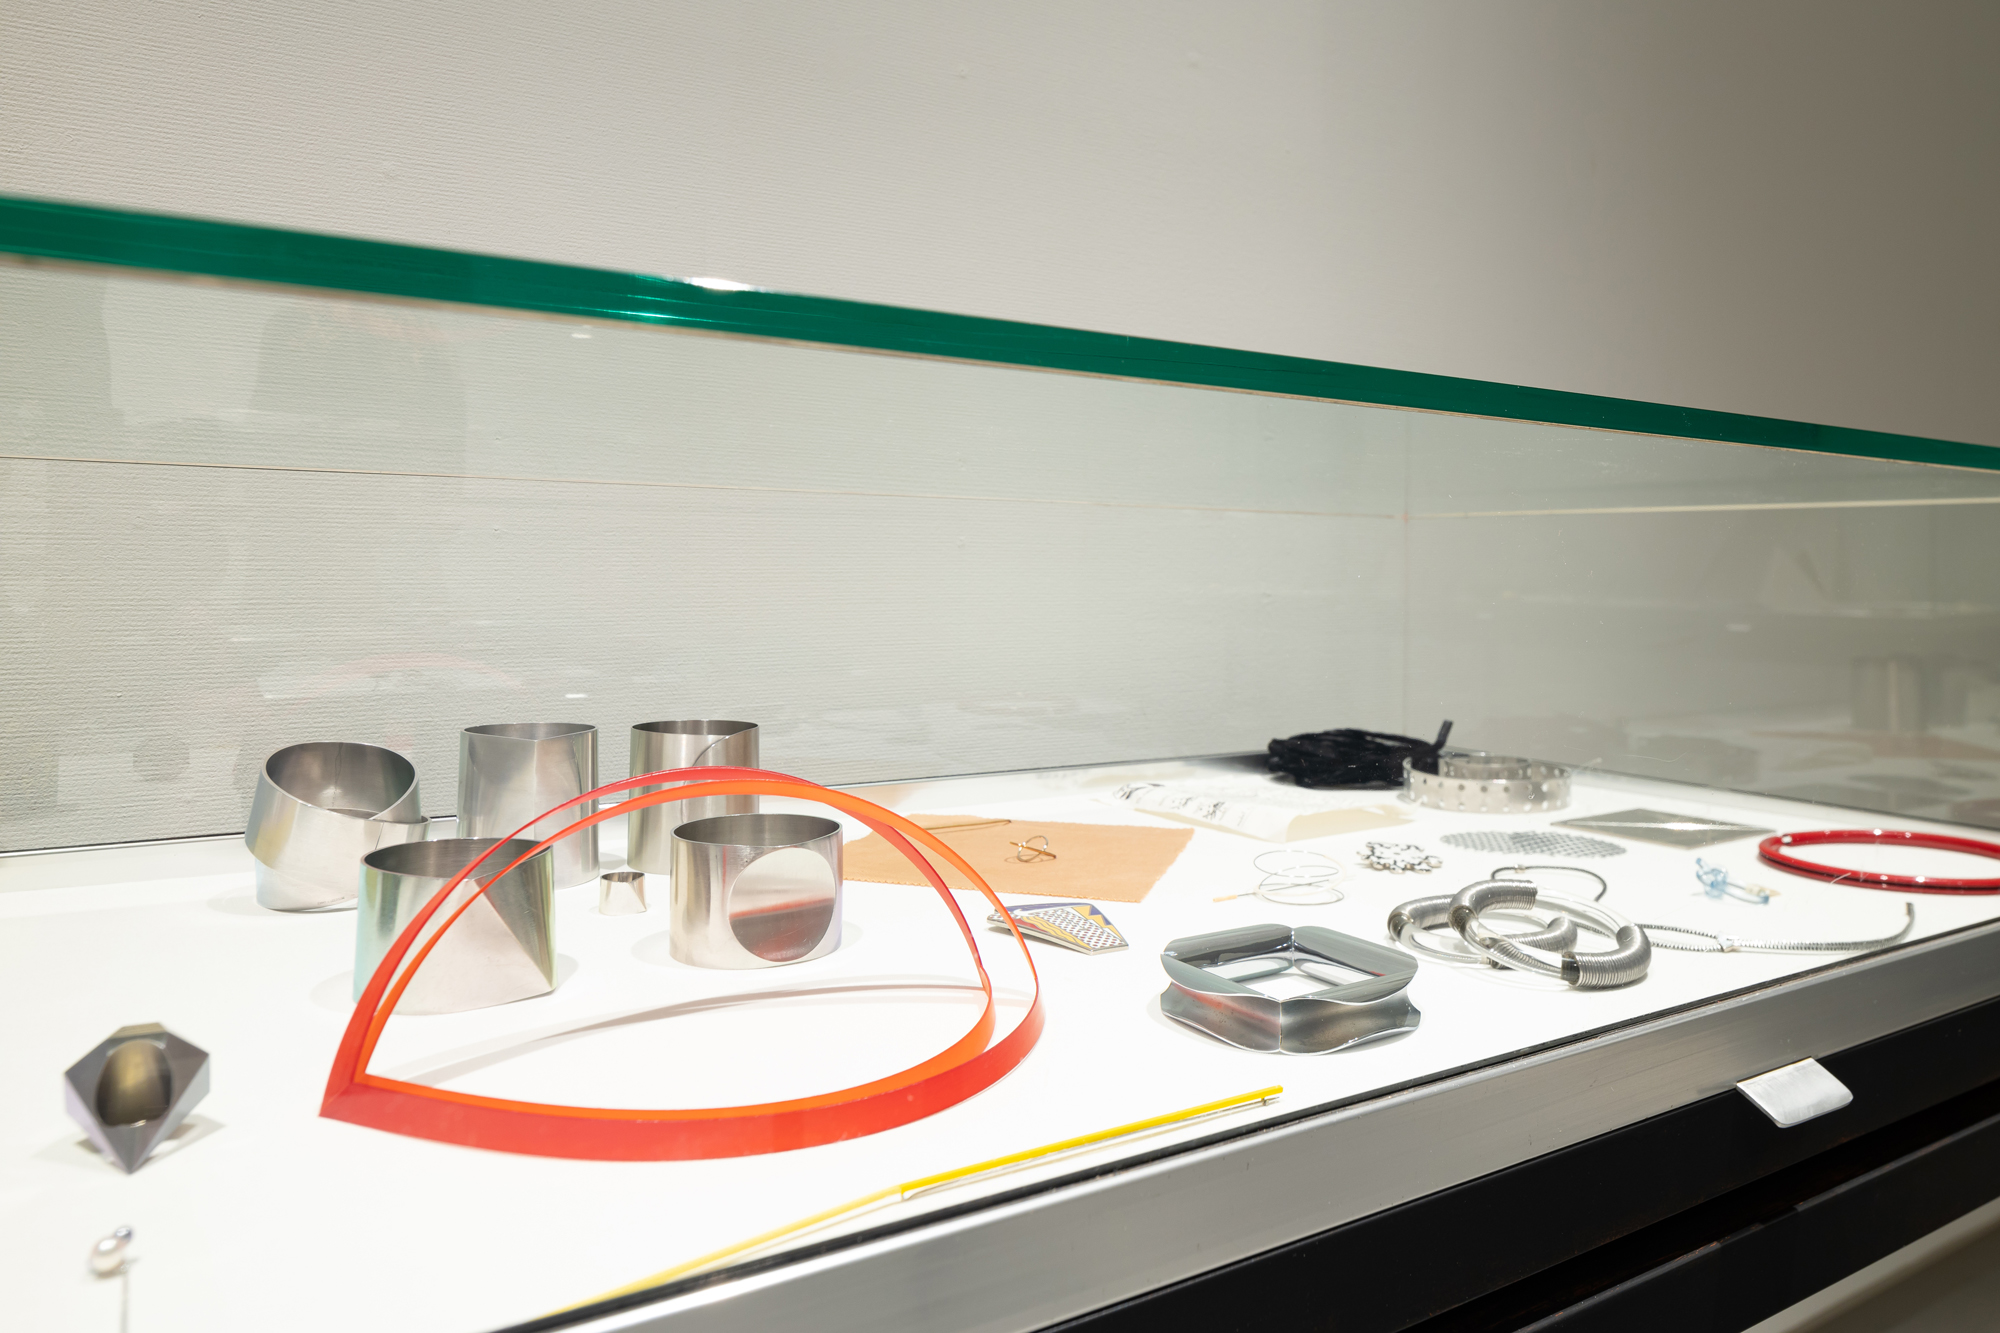 Benno Premsela - Strijder en verleider, Design Museum Den Bosch, 2021, vitrine, tentoonstelling, Emmy van Leersum, kunststof, metaal